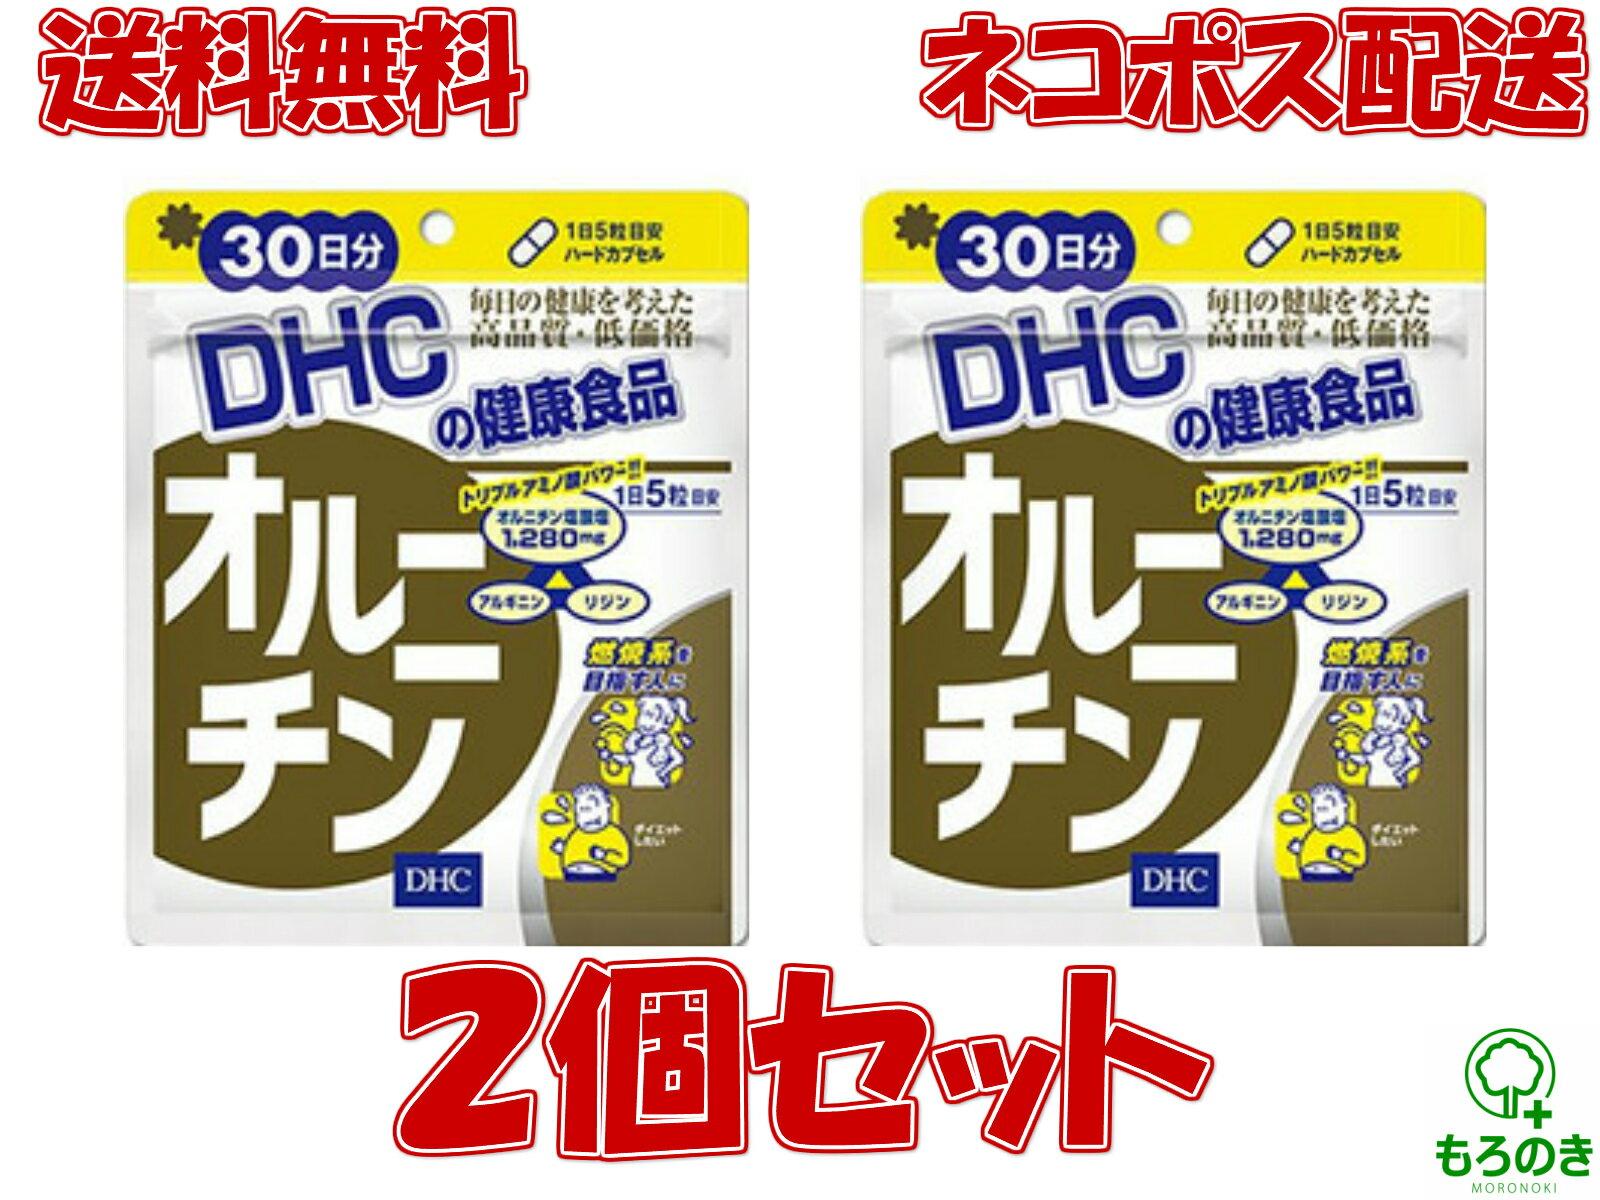 M【送料無料】【2個セット】DHC オルニチン 30日分 2P 【ネコポス配送】【M倉庫】